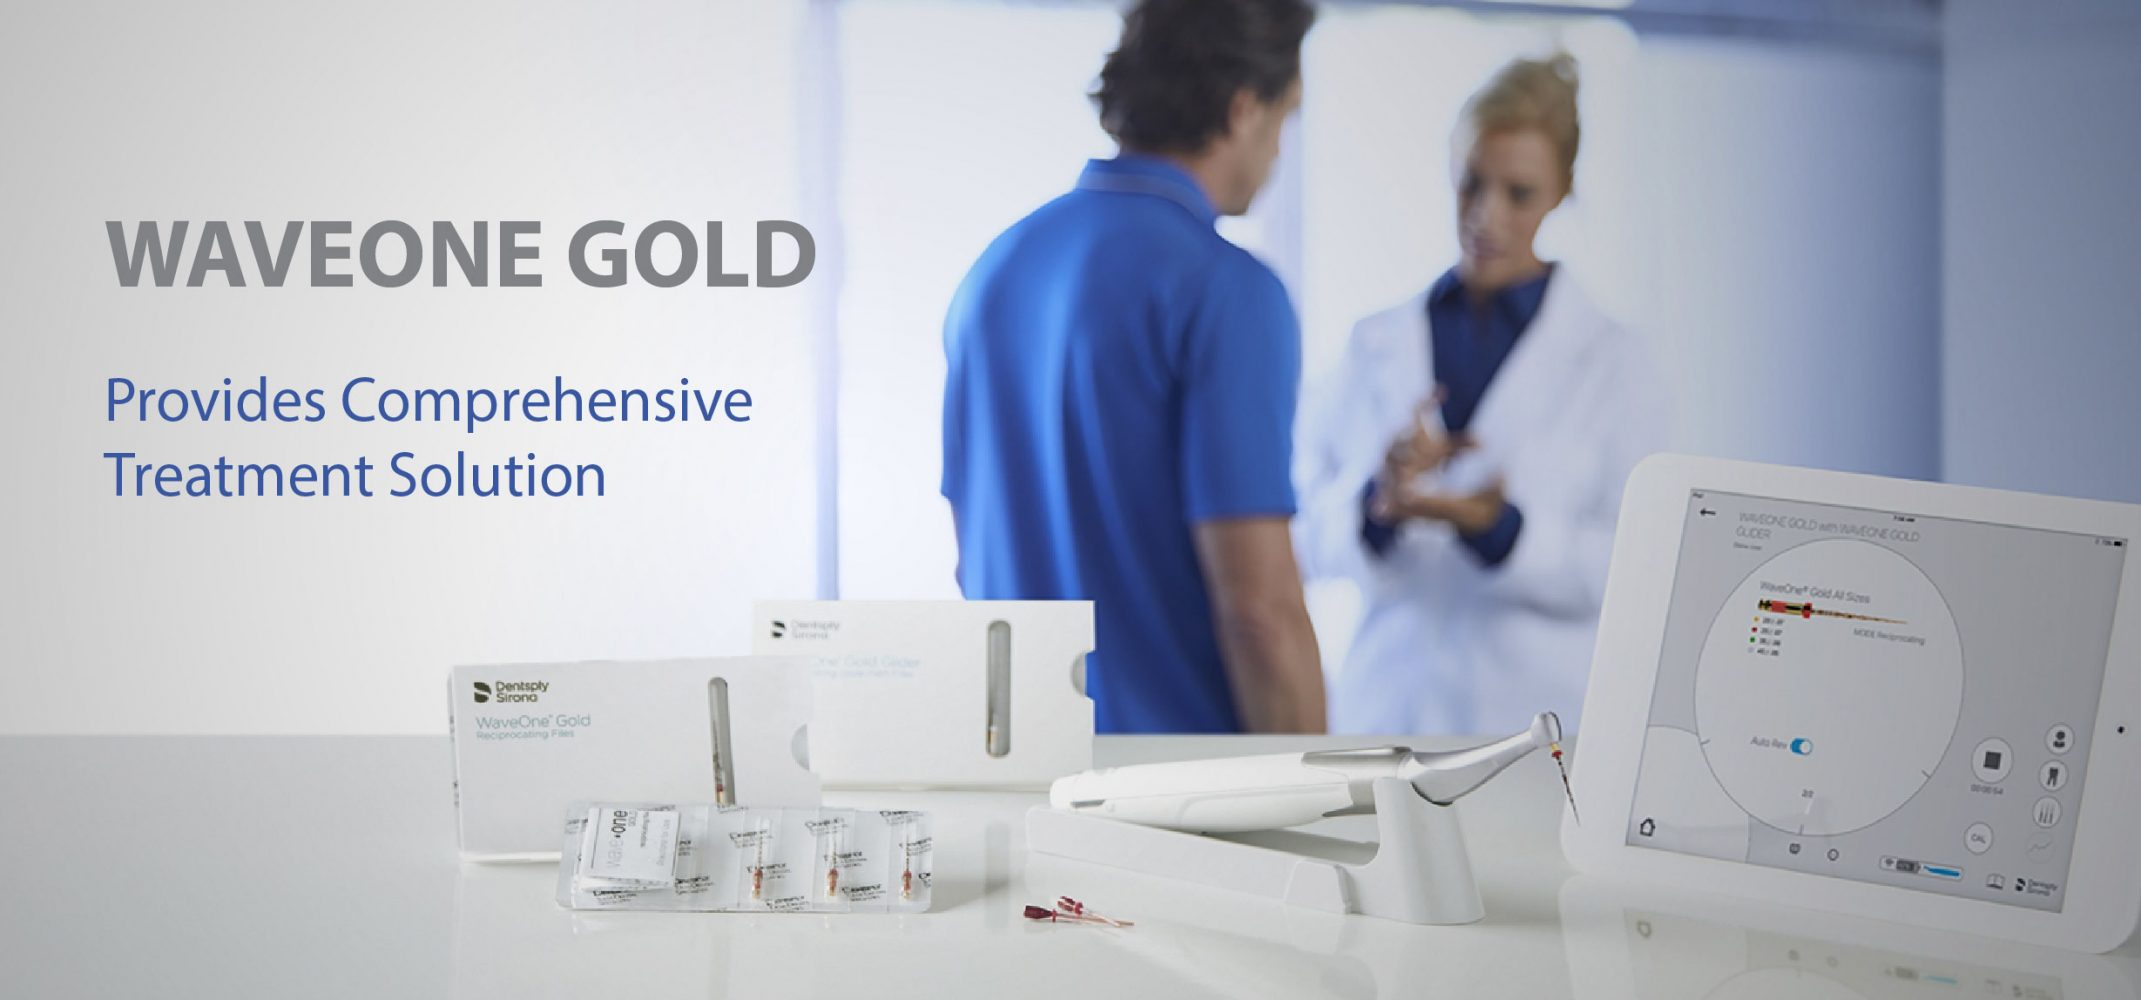 waveone gold website-01